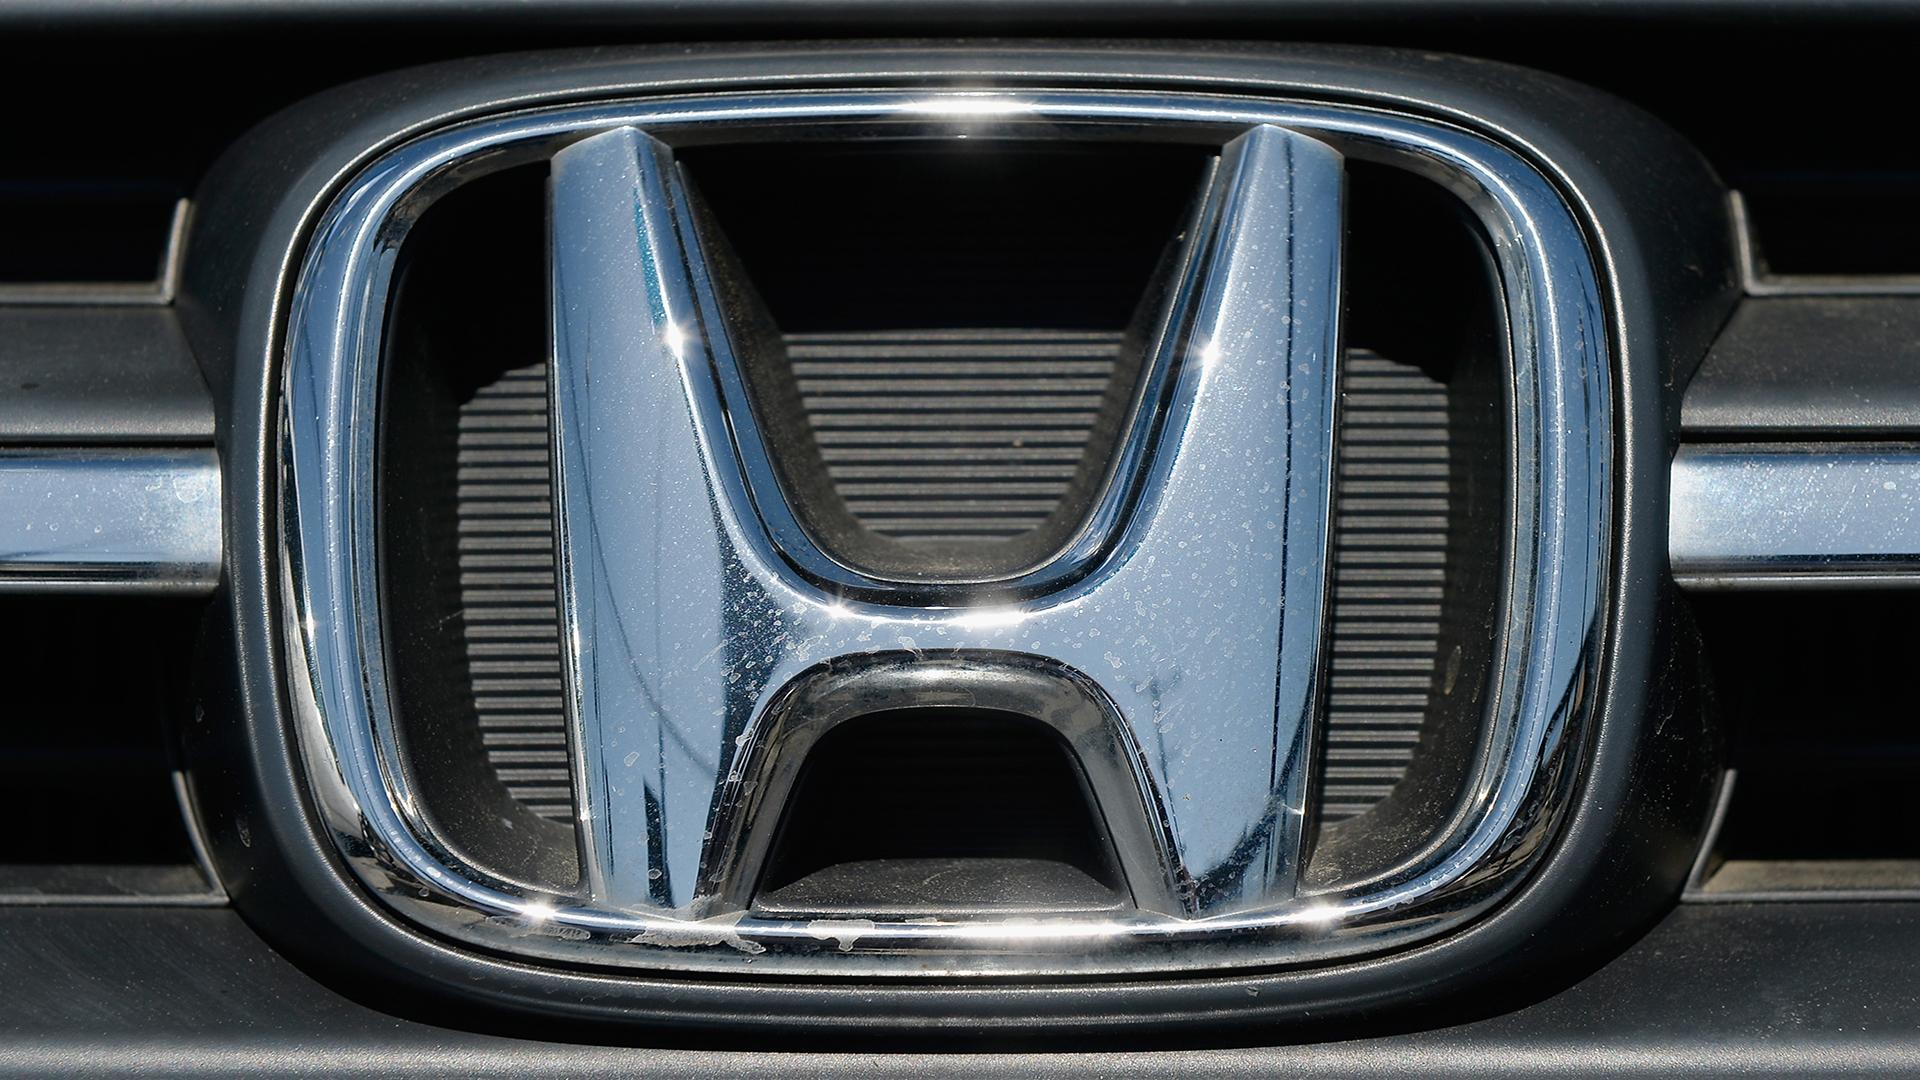 Honda to recall 118,000+ SUVs due to random airbag deployment